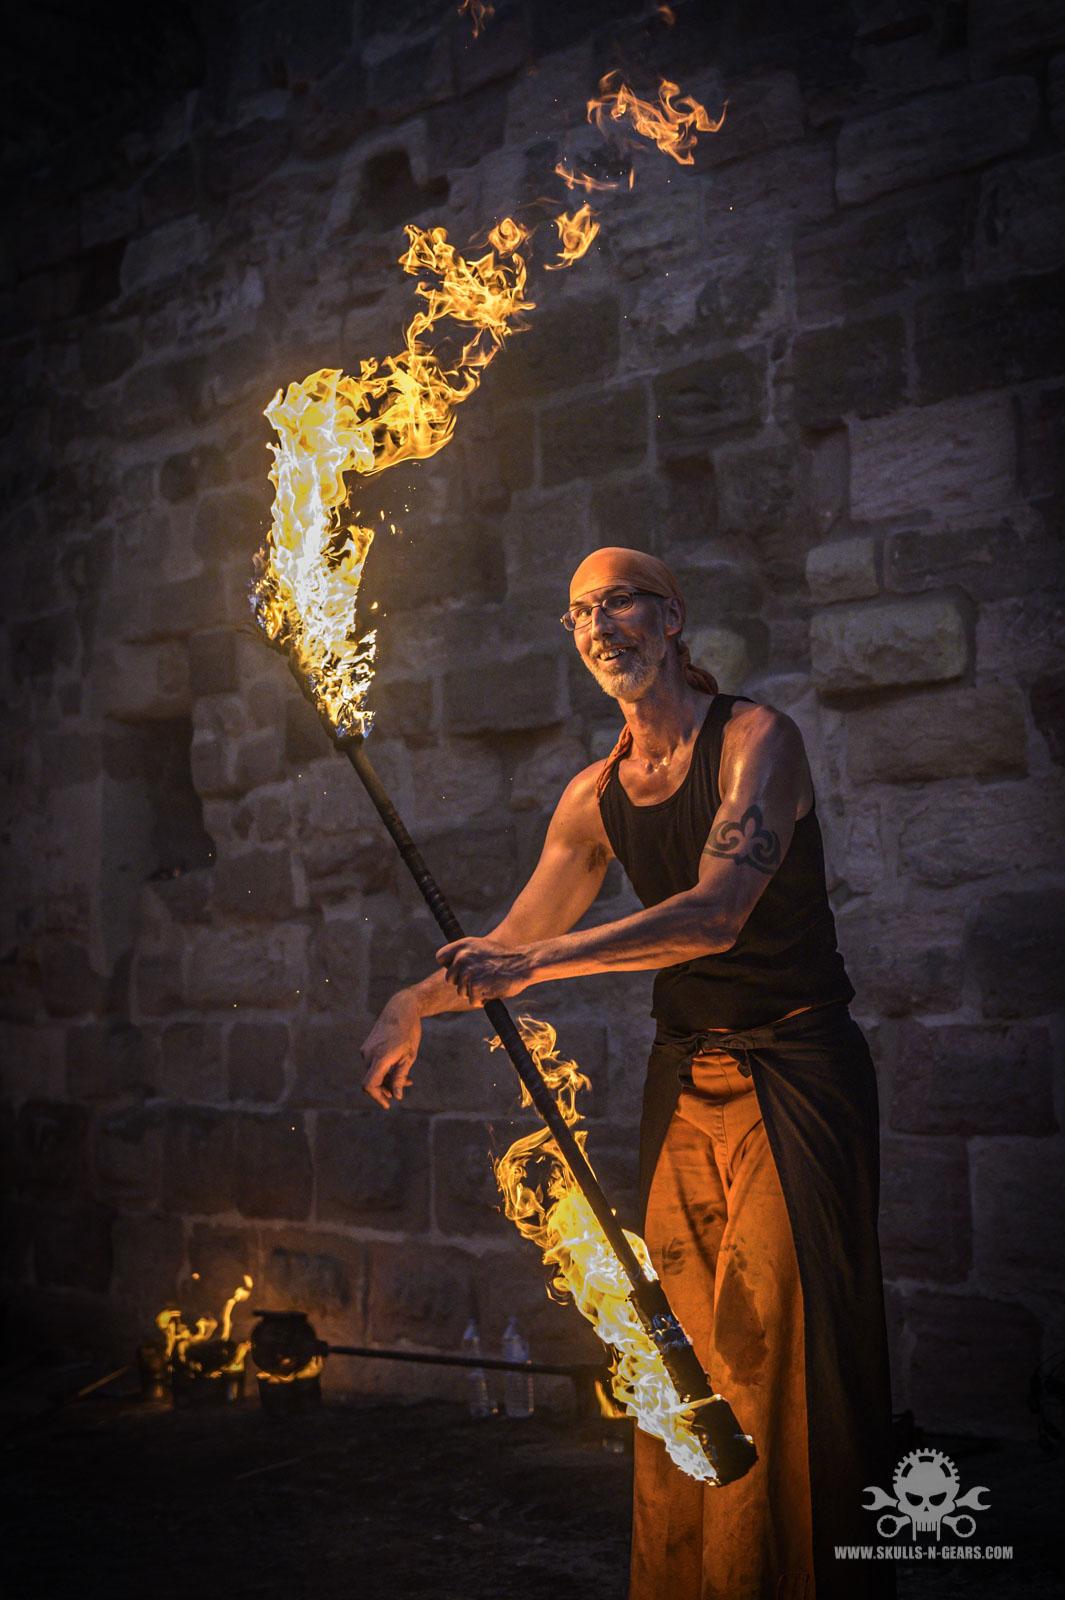 Feuertanz Festival 2019 - Feuershow-1170